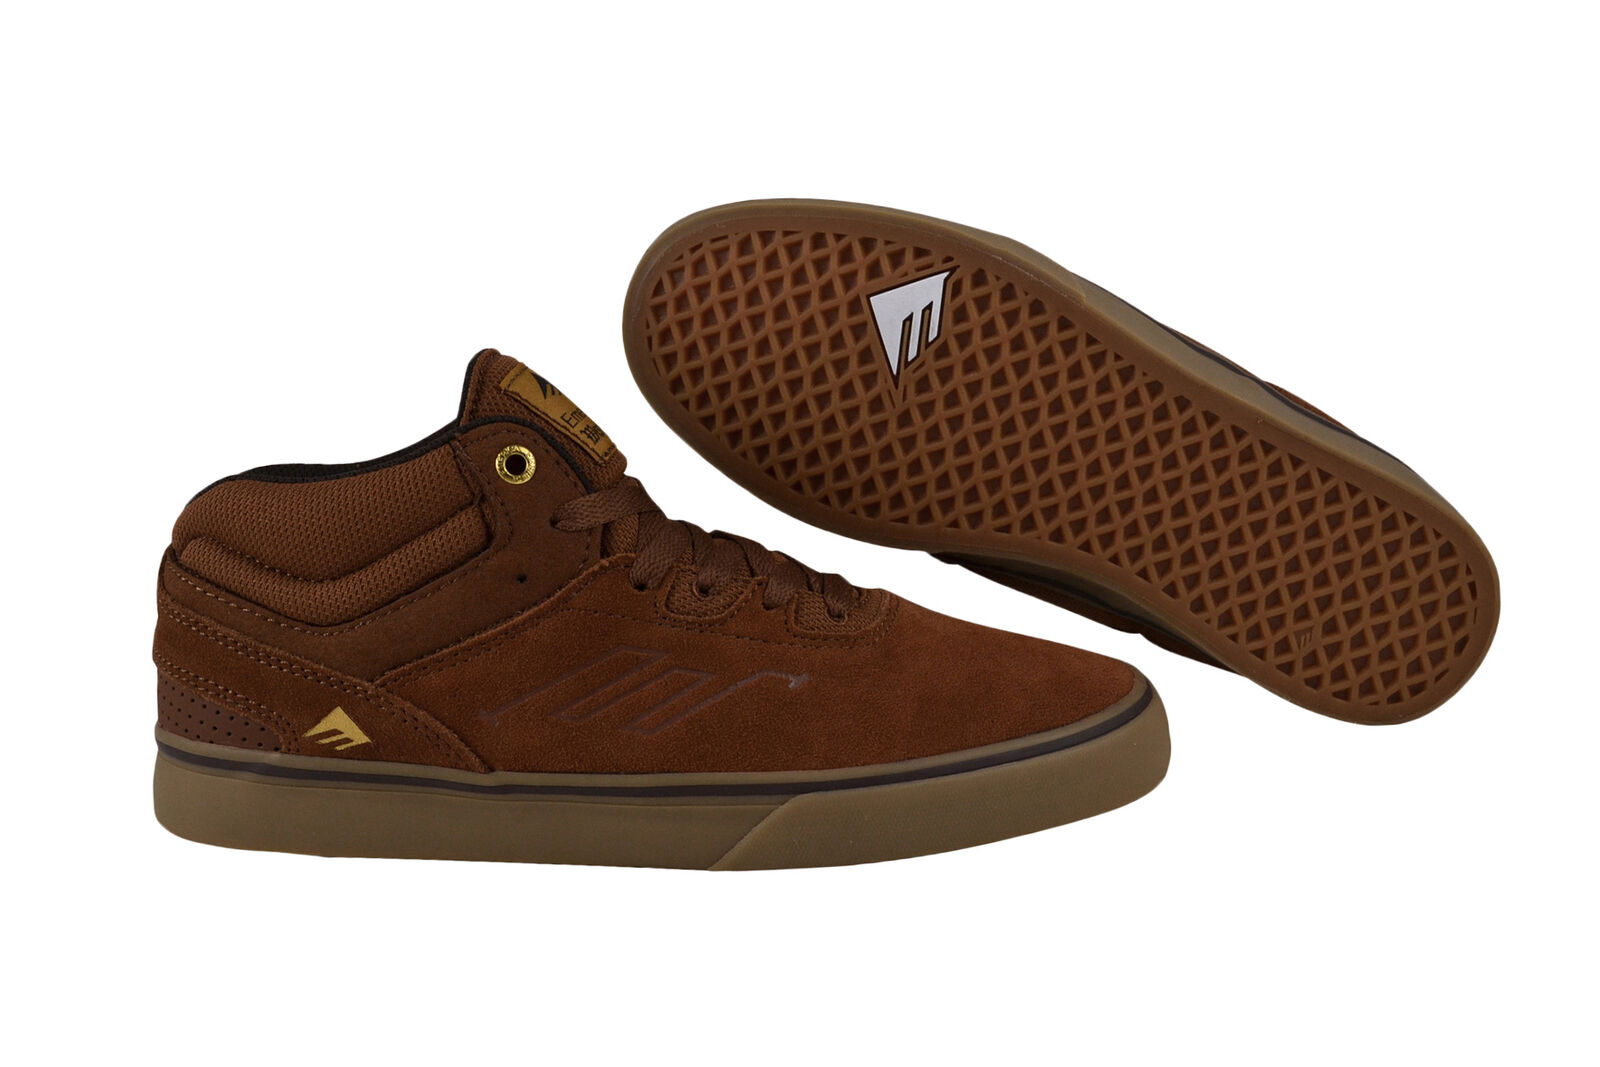 Emerica Westgate mid vulc Brown/Gum Sneaker/zapatos marrón